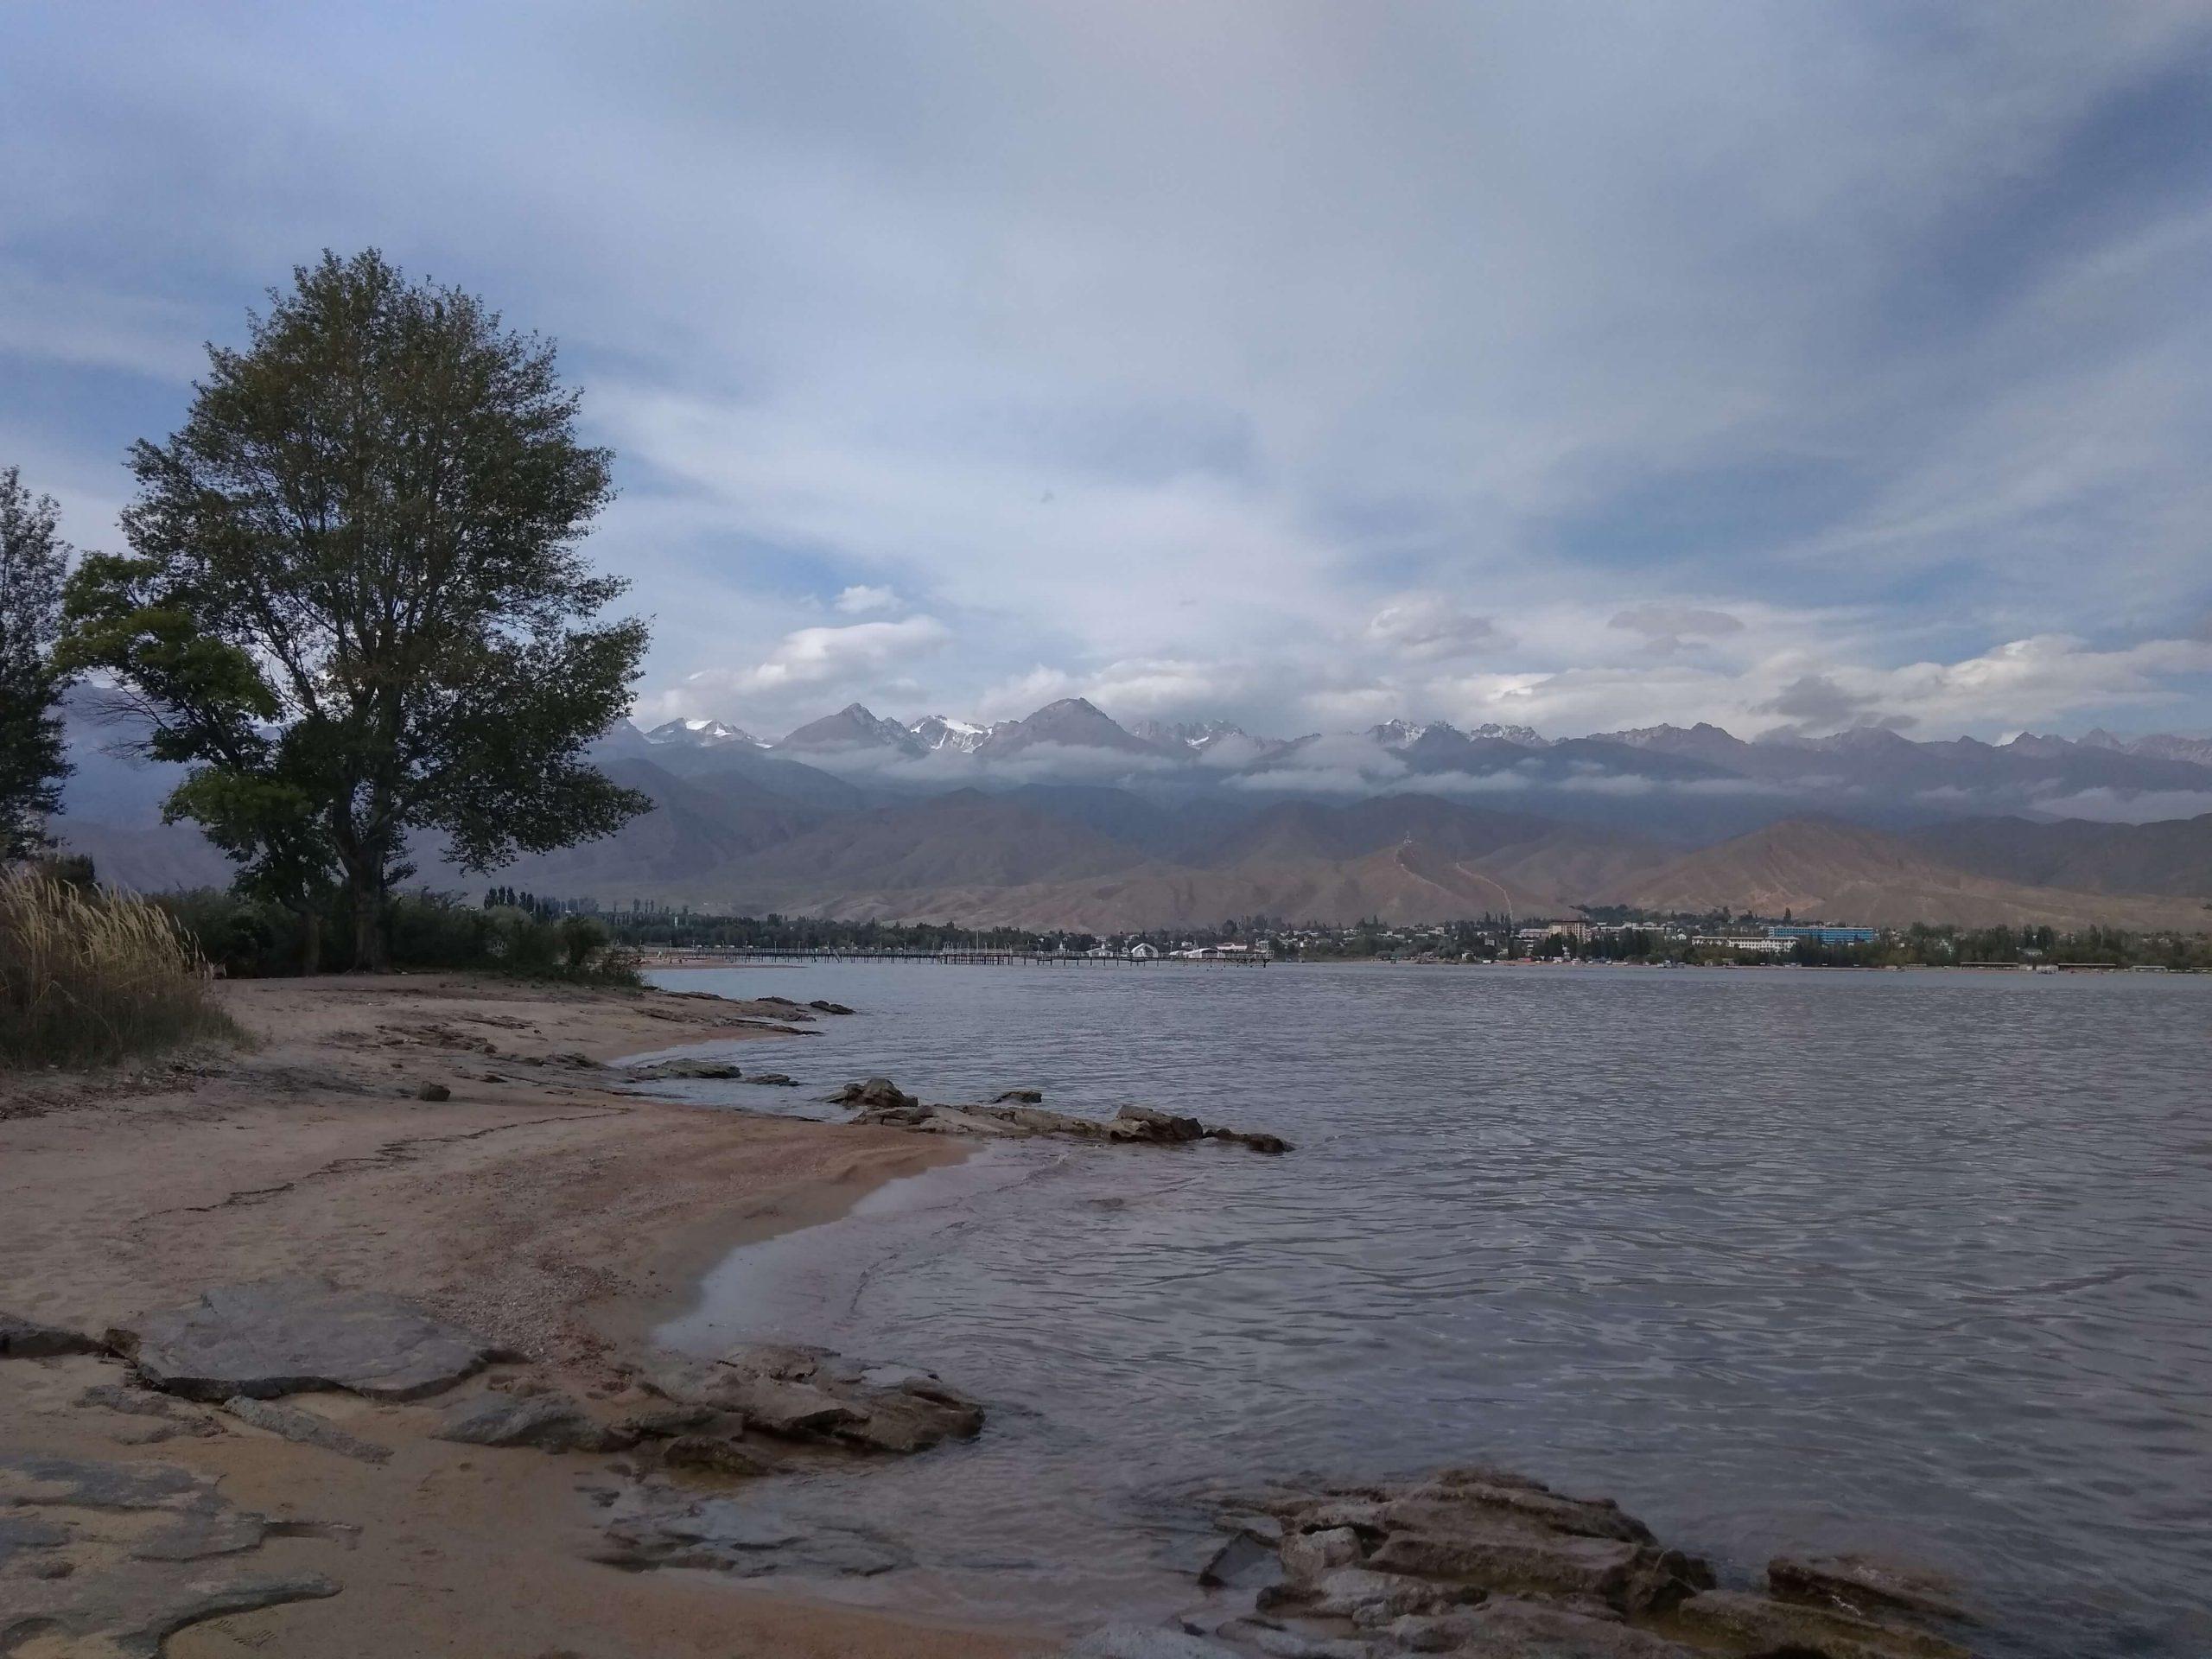 Orilla norte del Lago Issyk-Kul